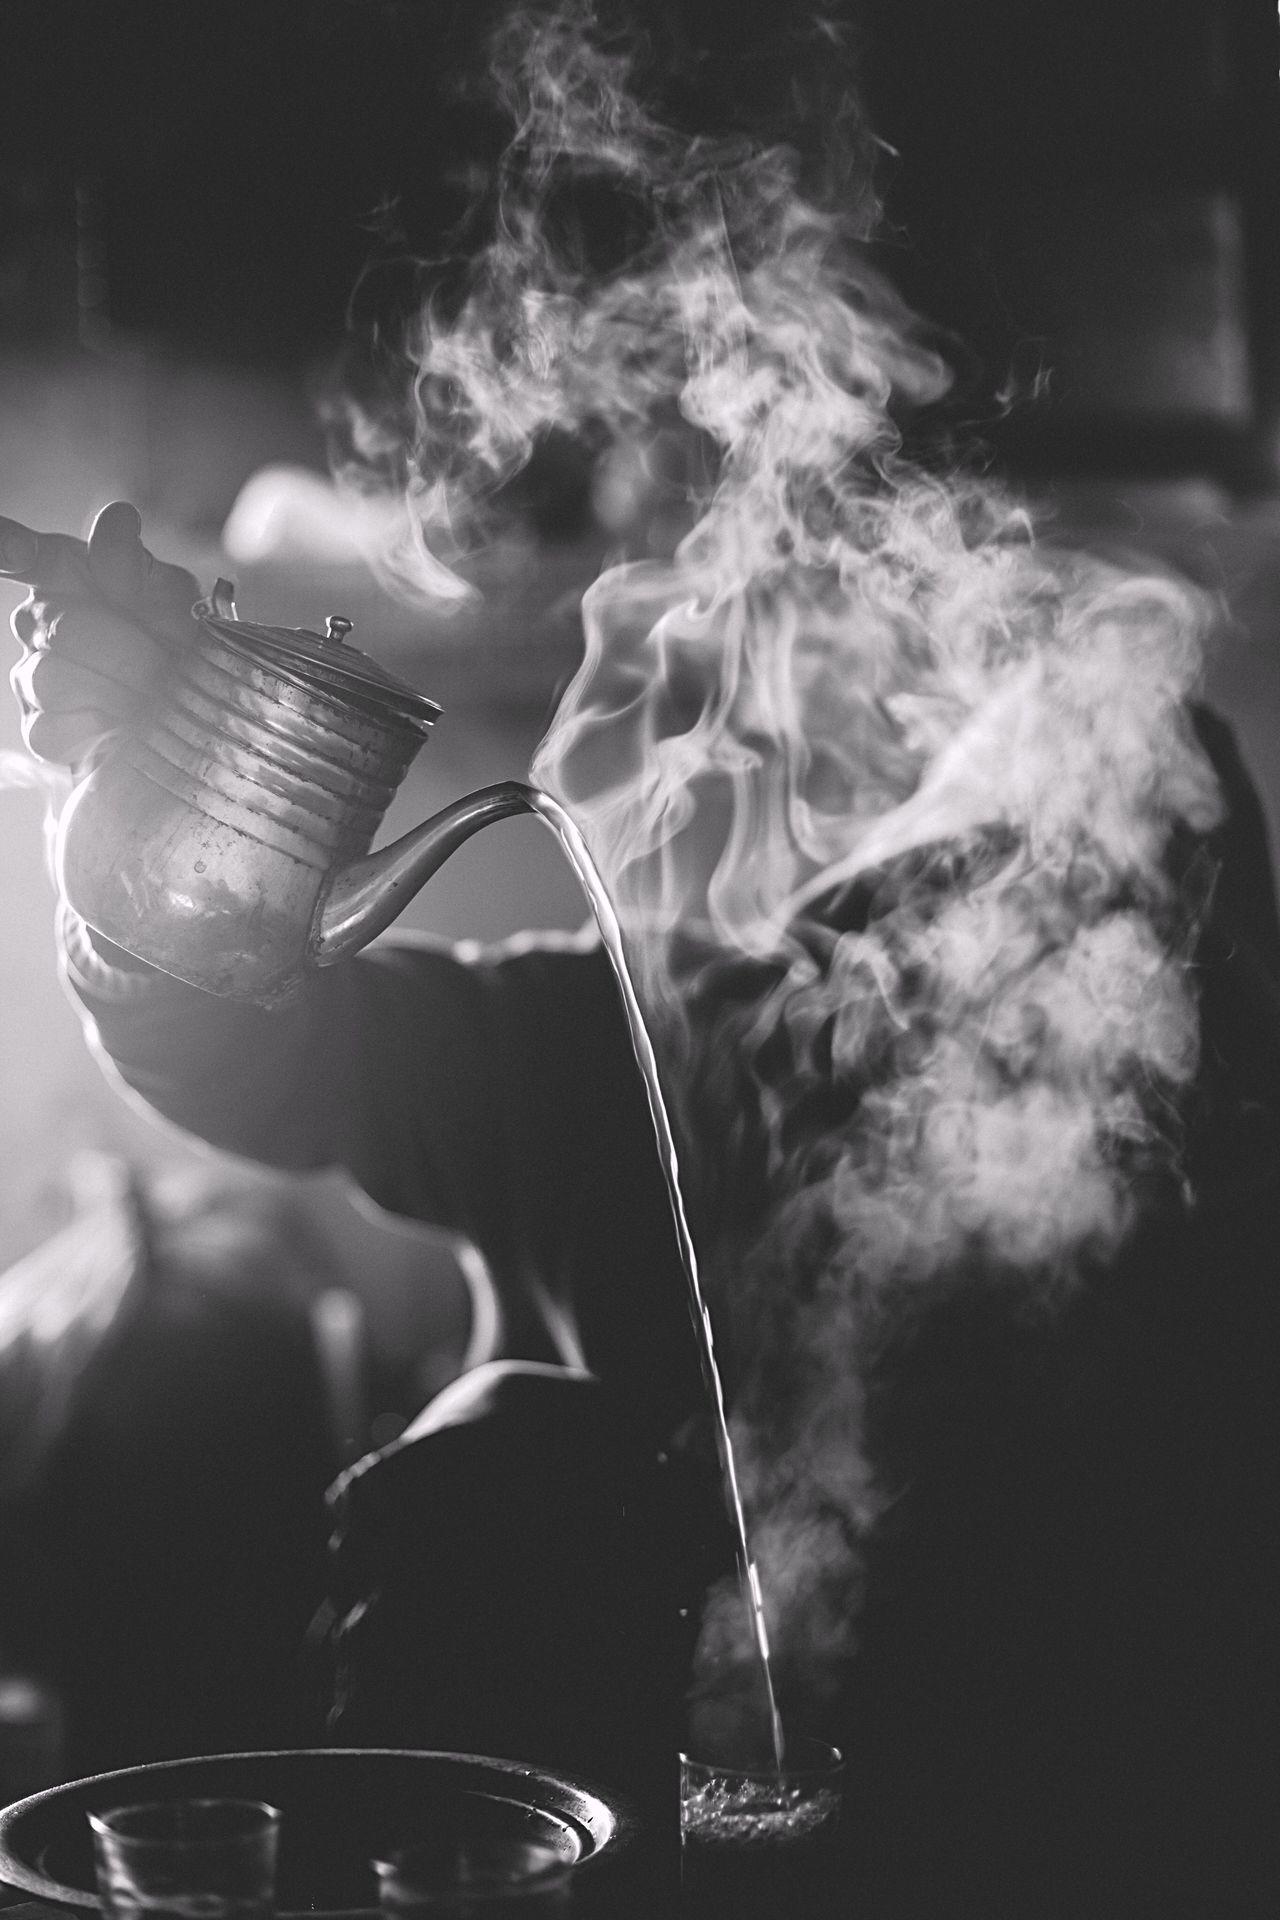 Morrocco Blackandwhite Noir Et Blanc Light And Shadow Lifestyles Smoke Tea Time Aftersurf